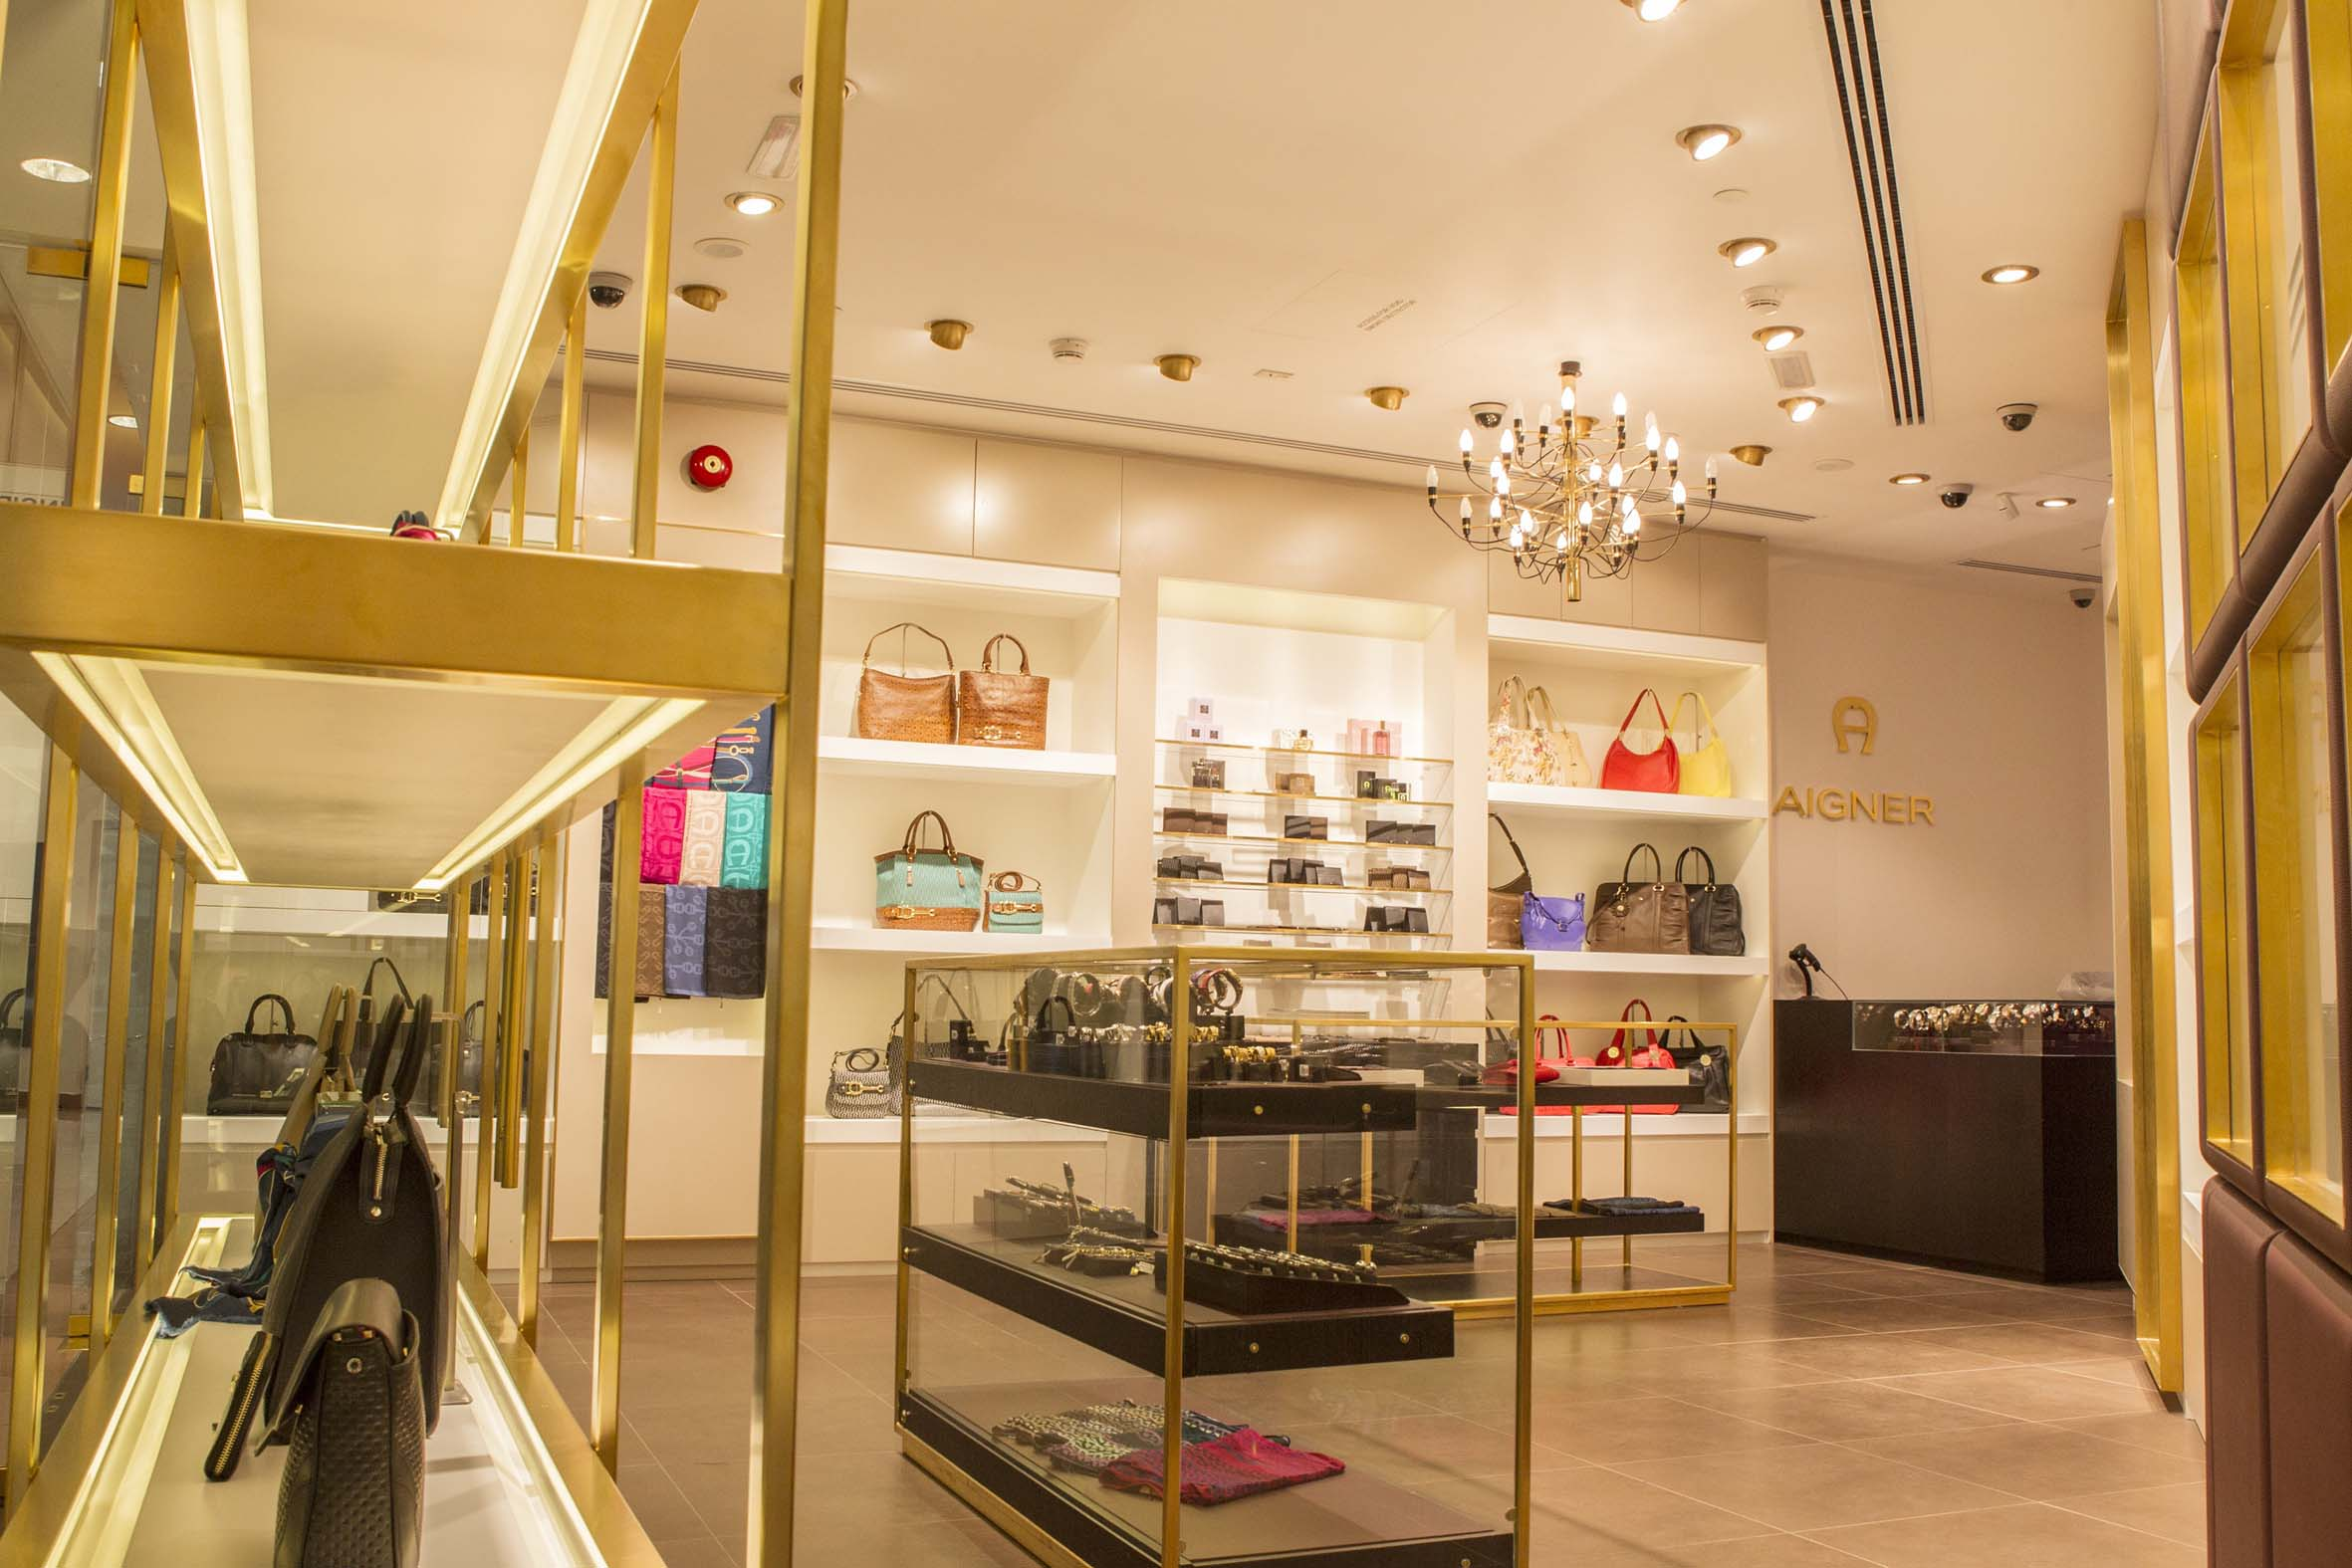 AIGNER – Marina Mall Abu Dhabi 13